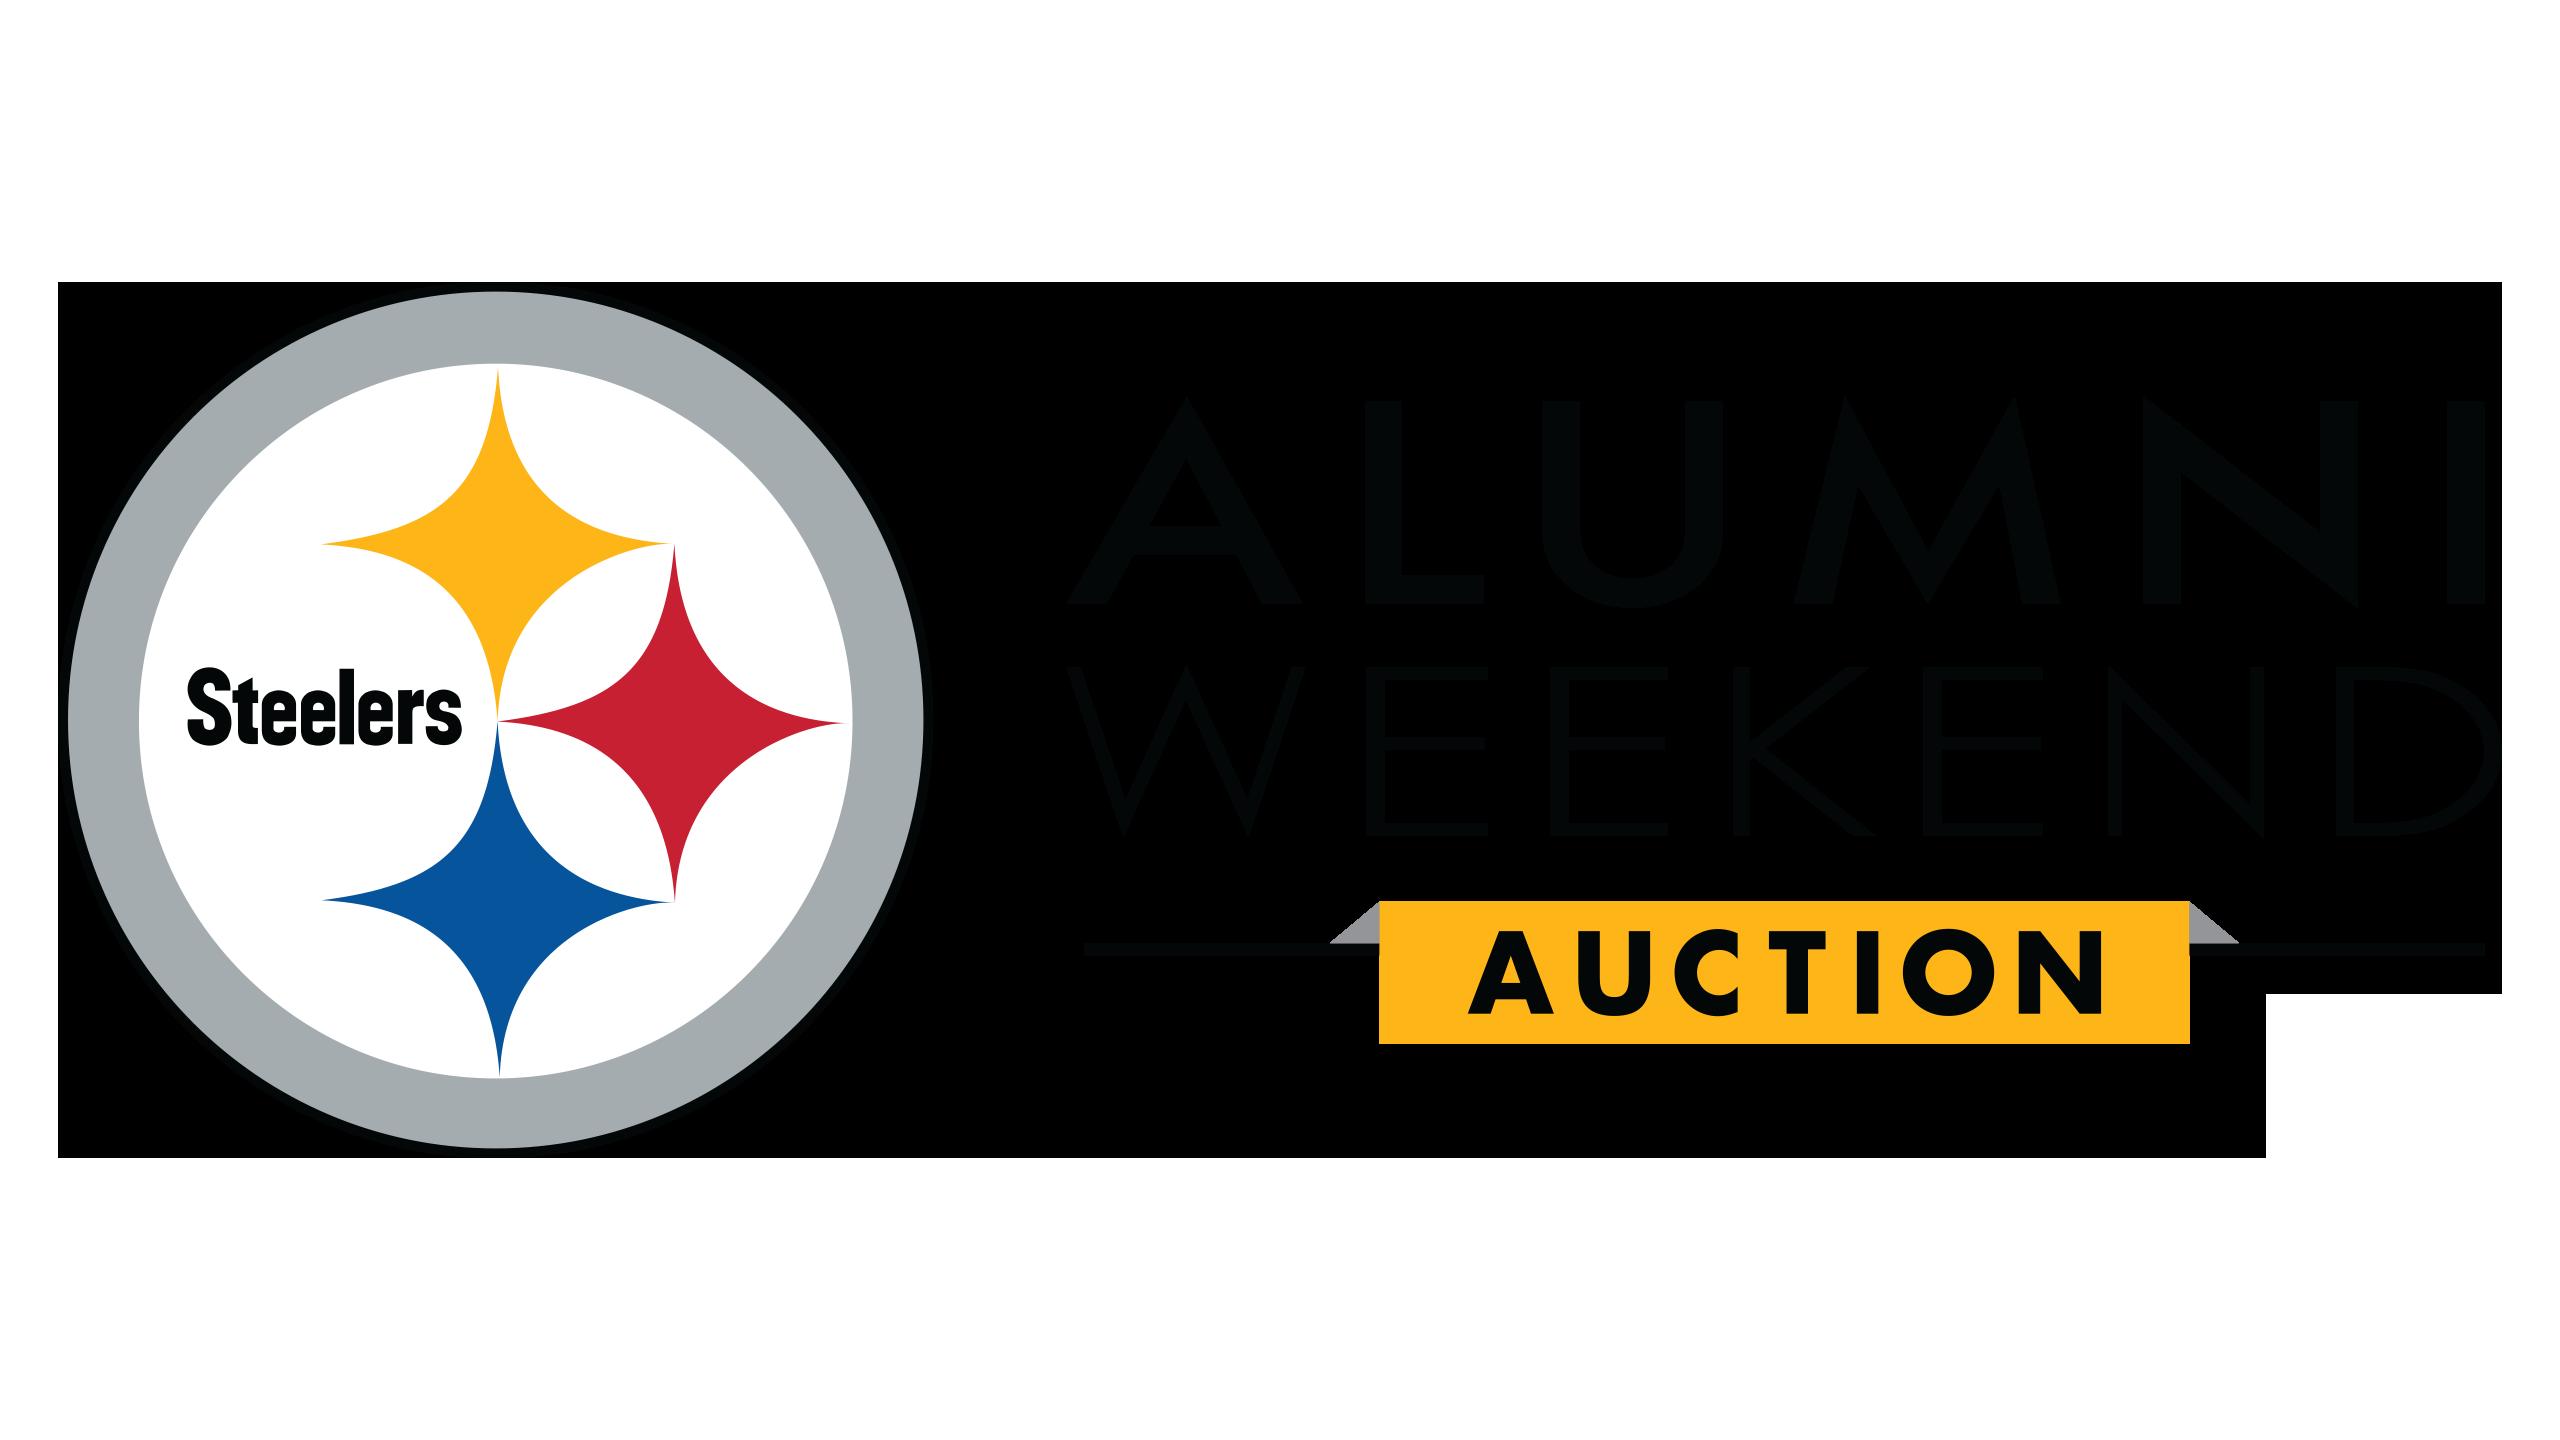 Alumni Weekend Auction